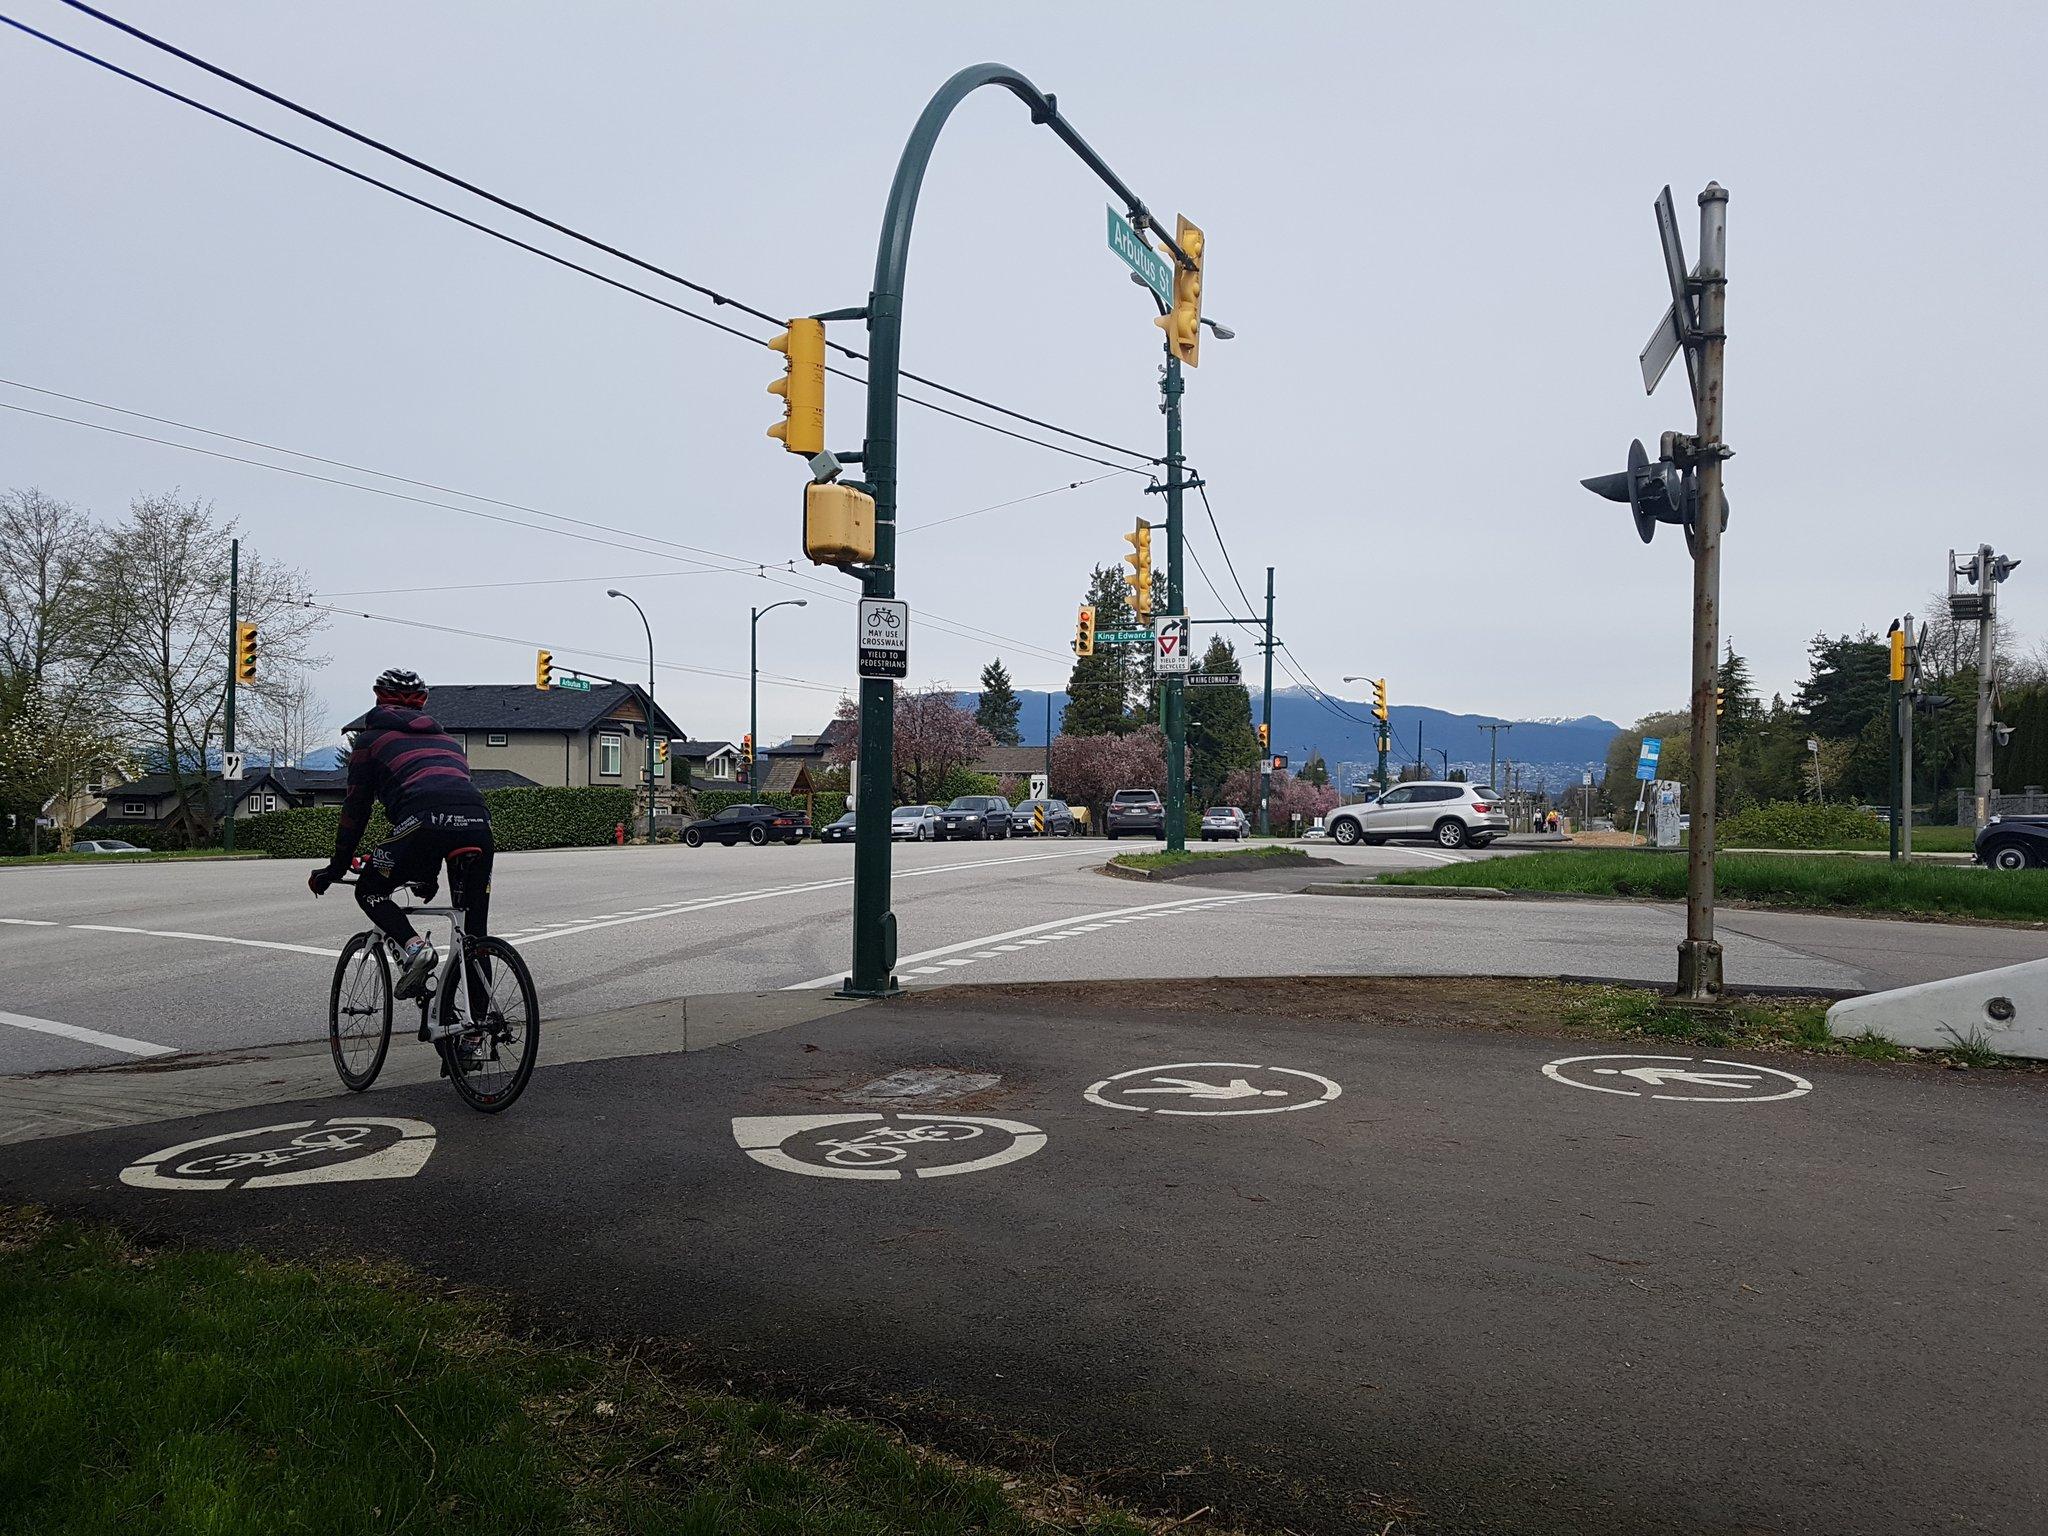 With major road crossings having Yield to Bike signs & may use crosswalk #yyjbike https://t.co/RWUtTcq7b3